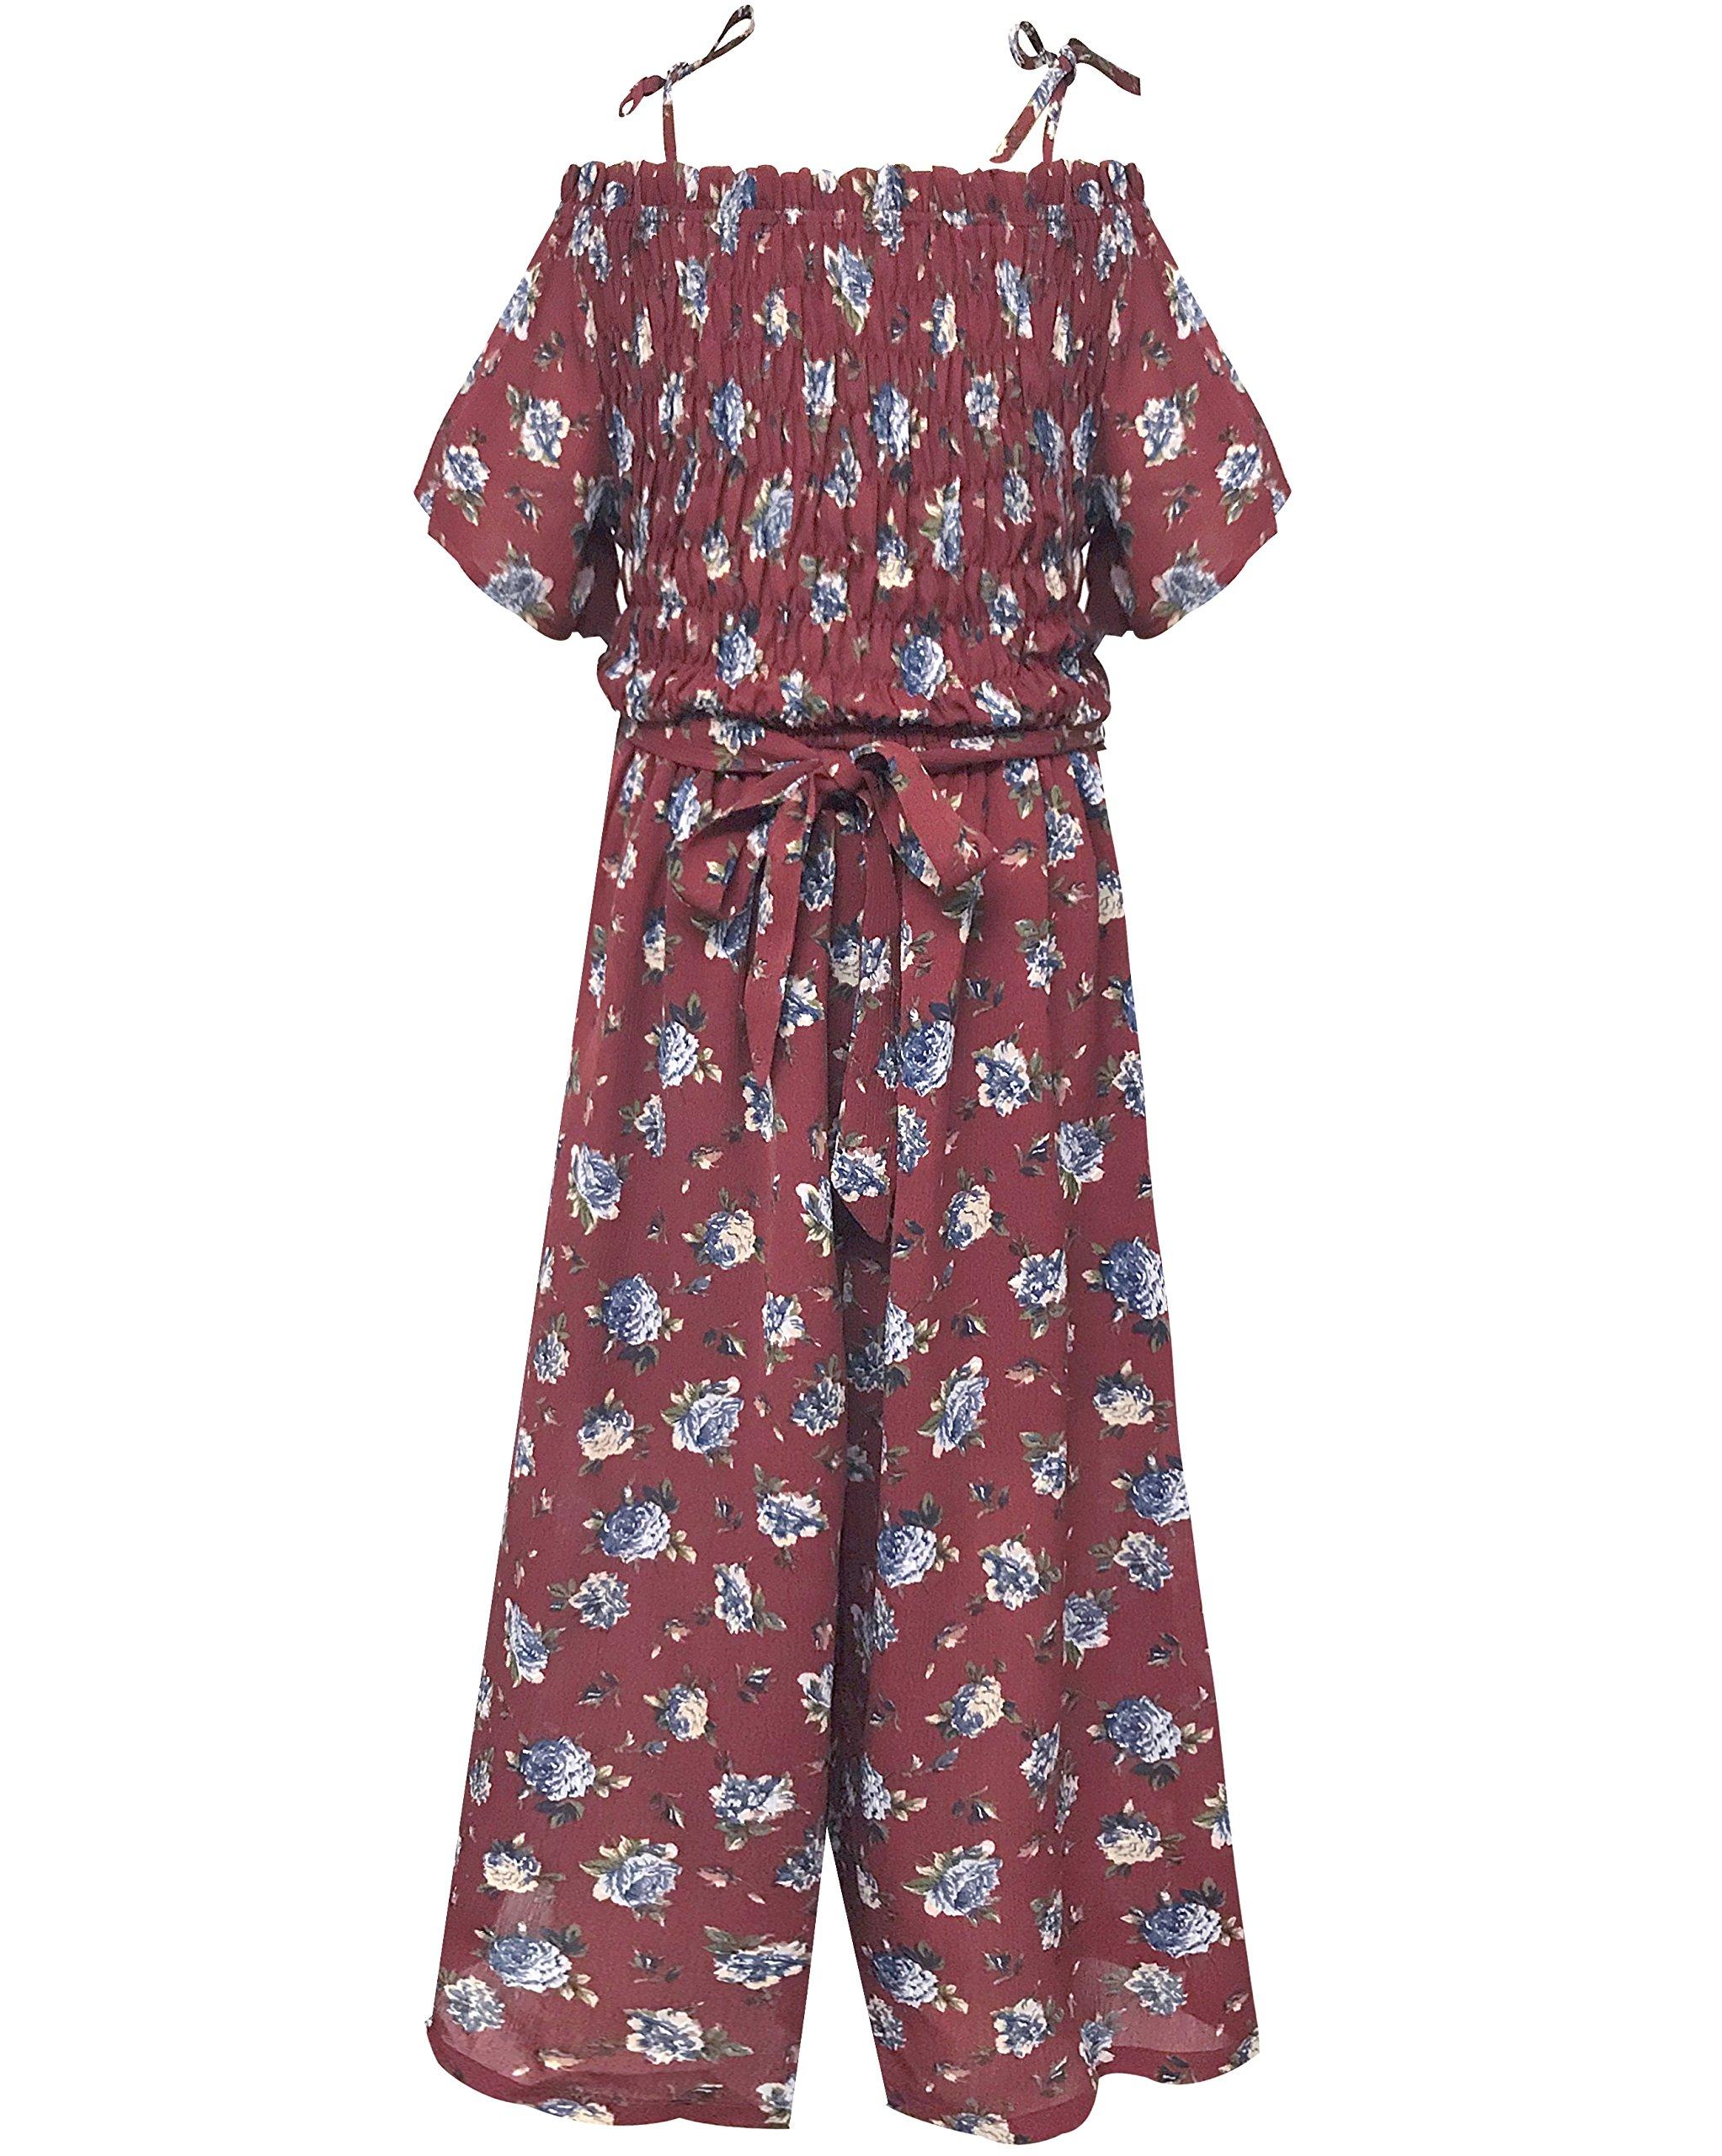 Smukke, Big Girls Tween Floral Printed Jumpsuits (Many Options), 7-16 (Burgundy Multi, 8)